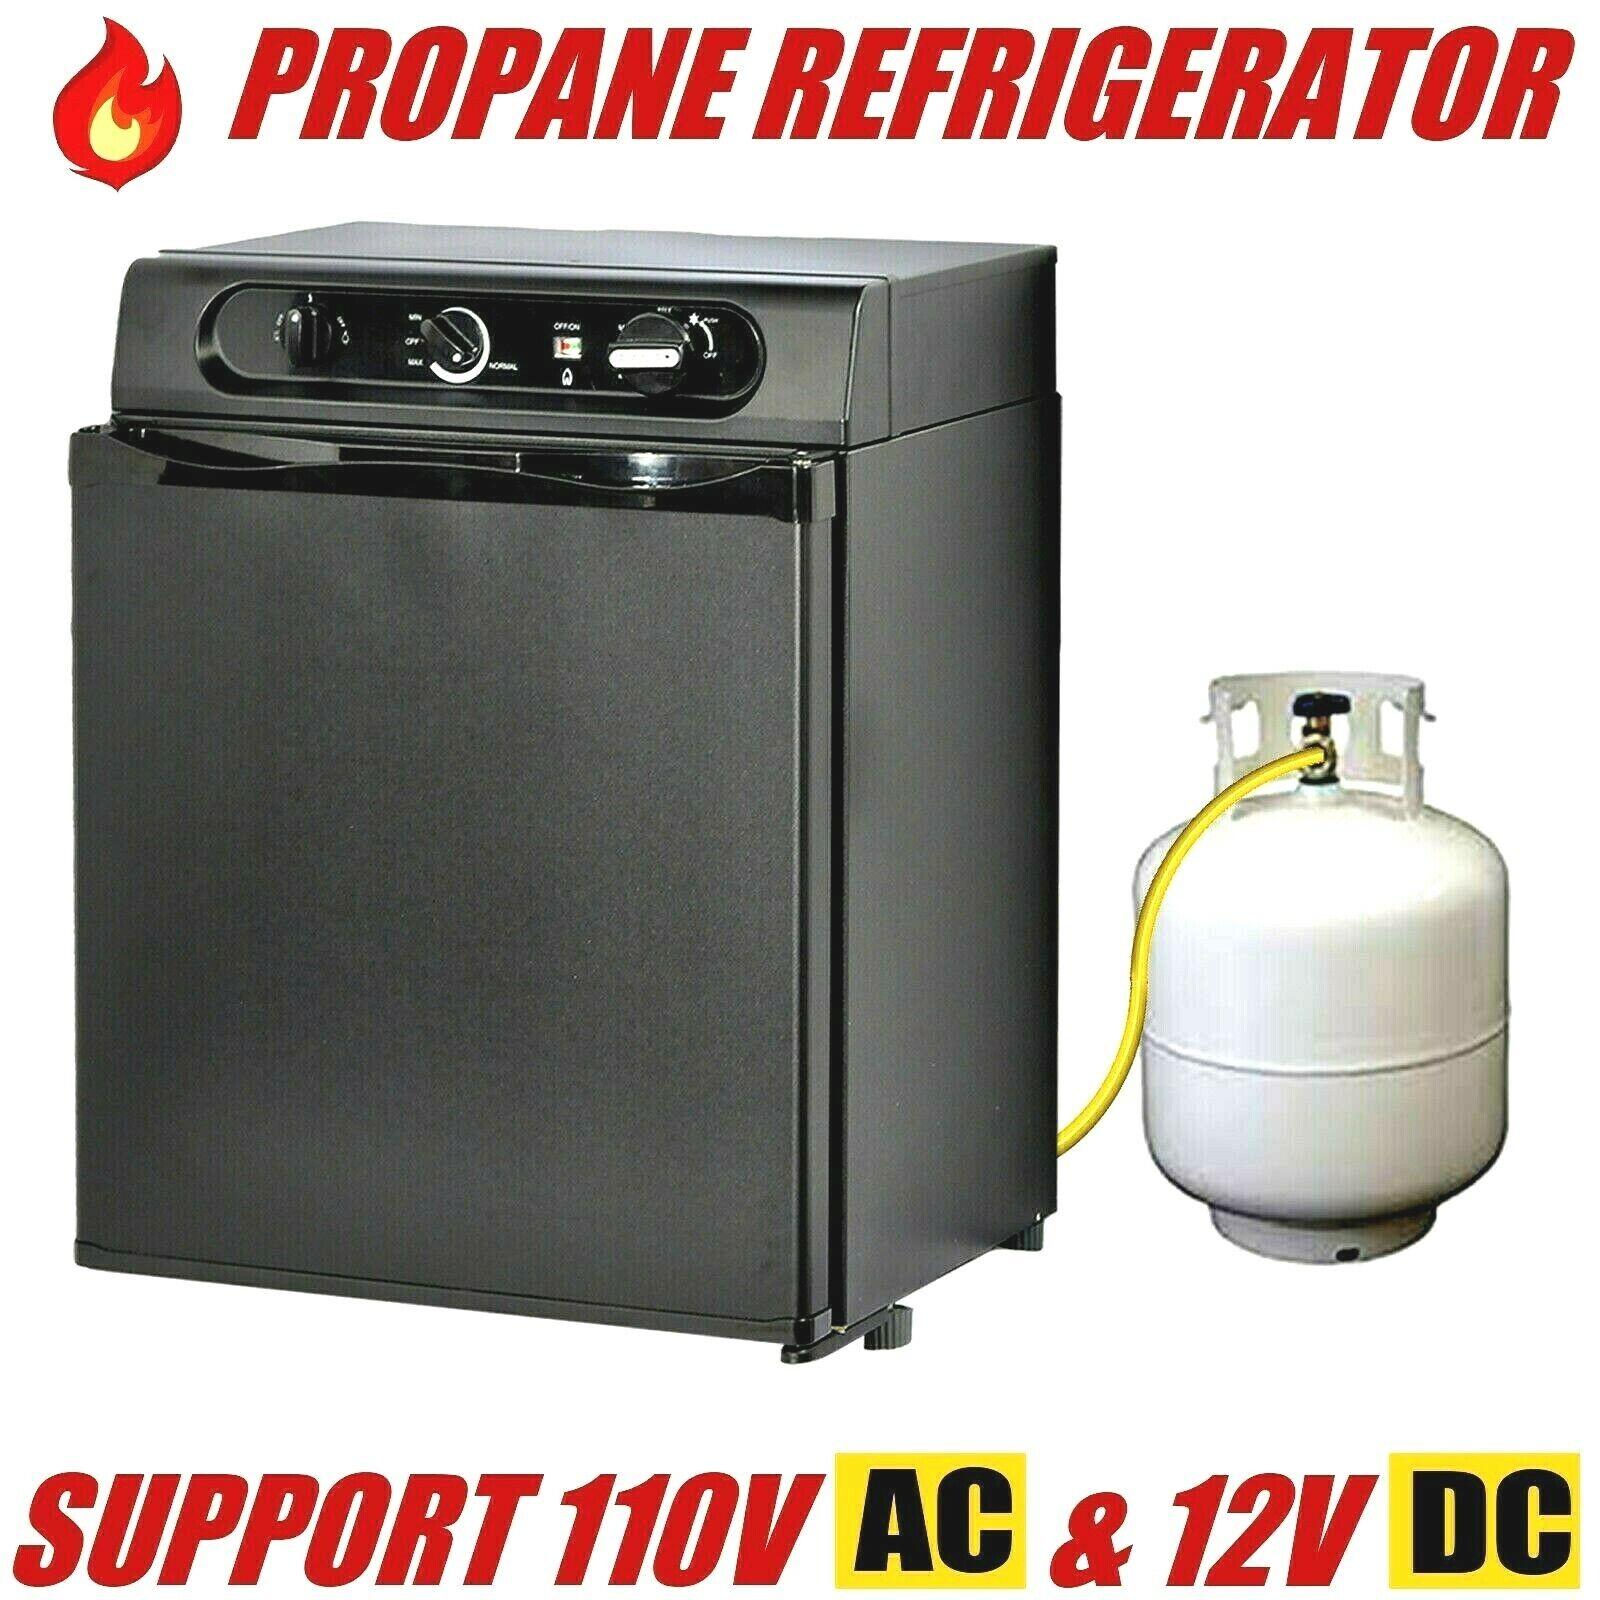 Gas Fridge Propane Refrigerator RV Dorm Compact Freestanding AC/DC 1.4 Cu ft